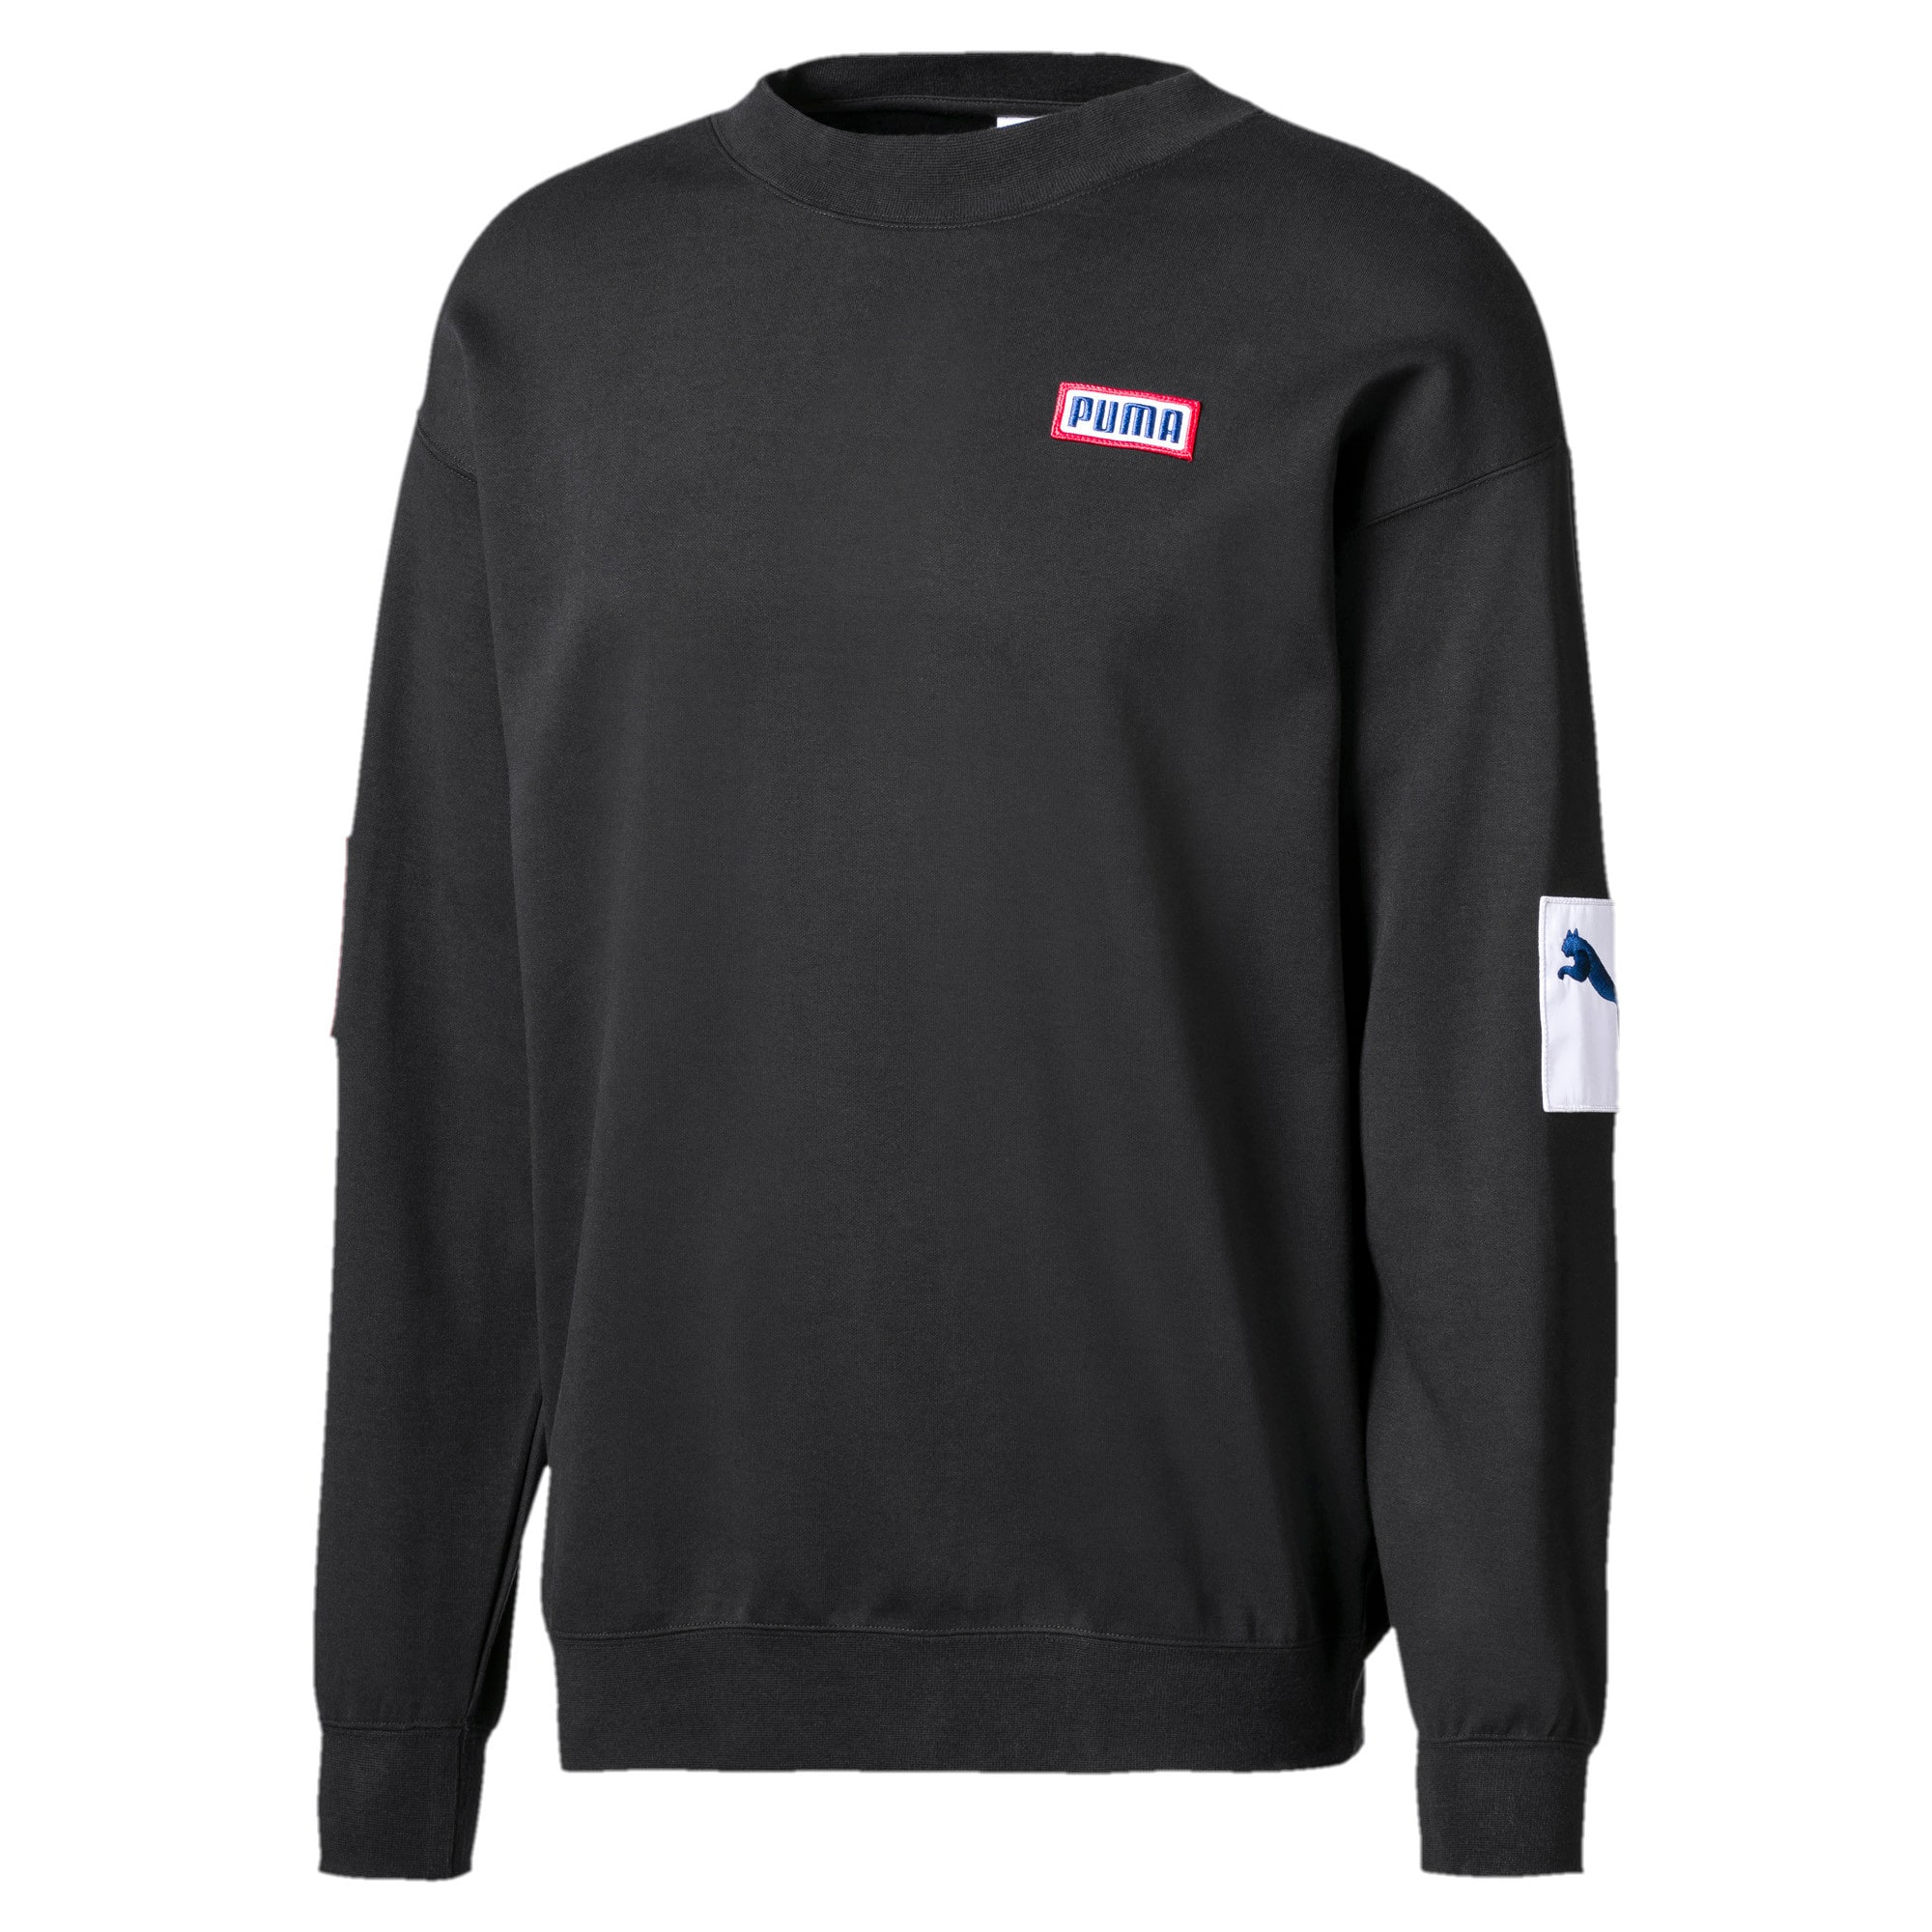 Thumbnail 1 of Men's Crew Sweater, Puma Black, medium